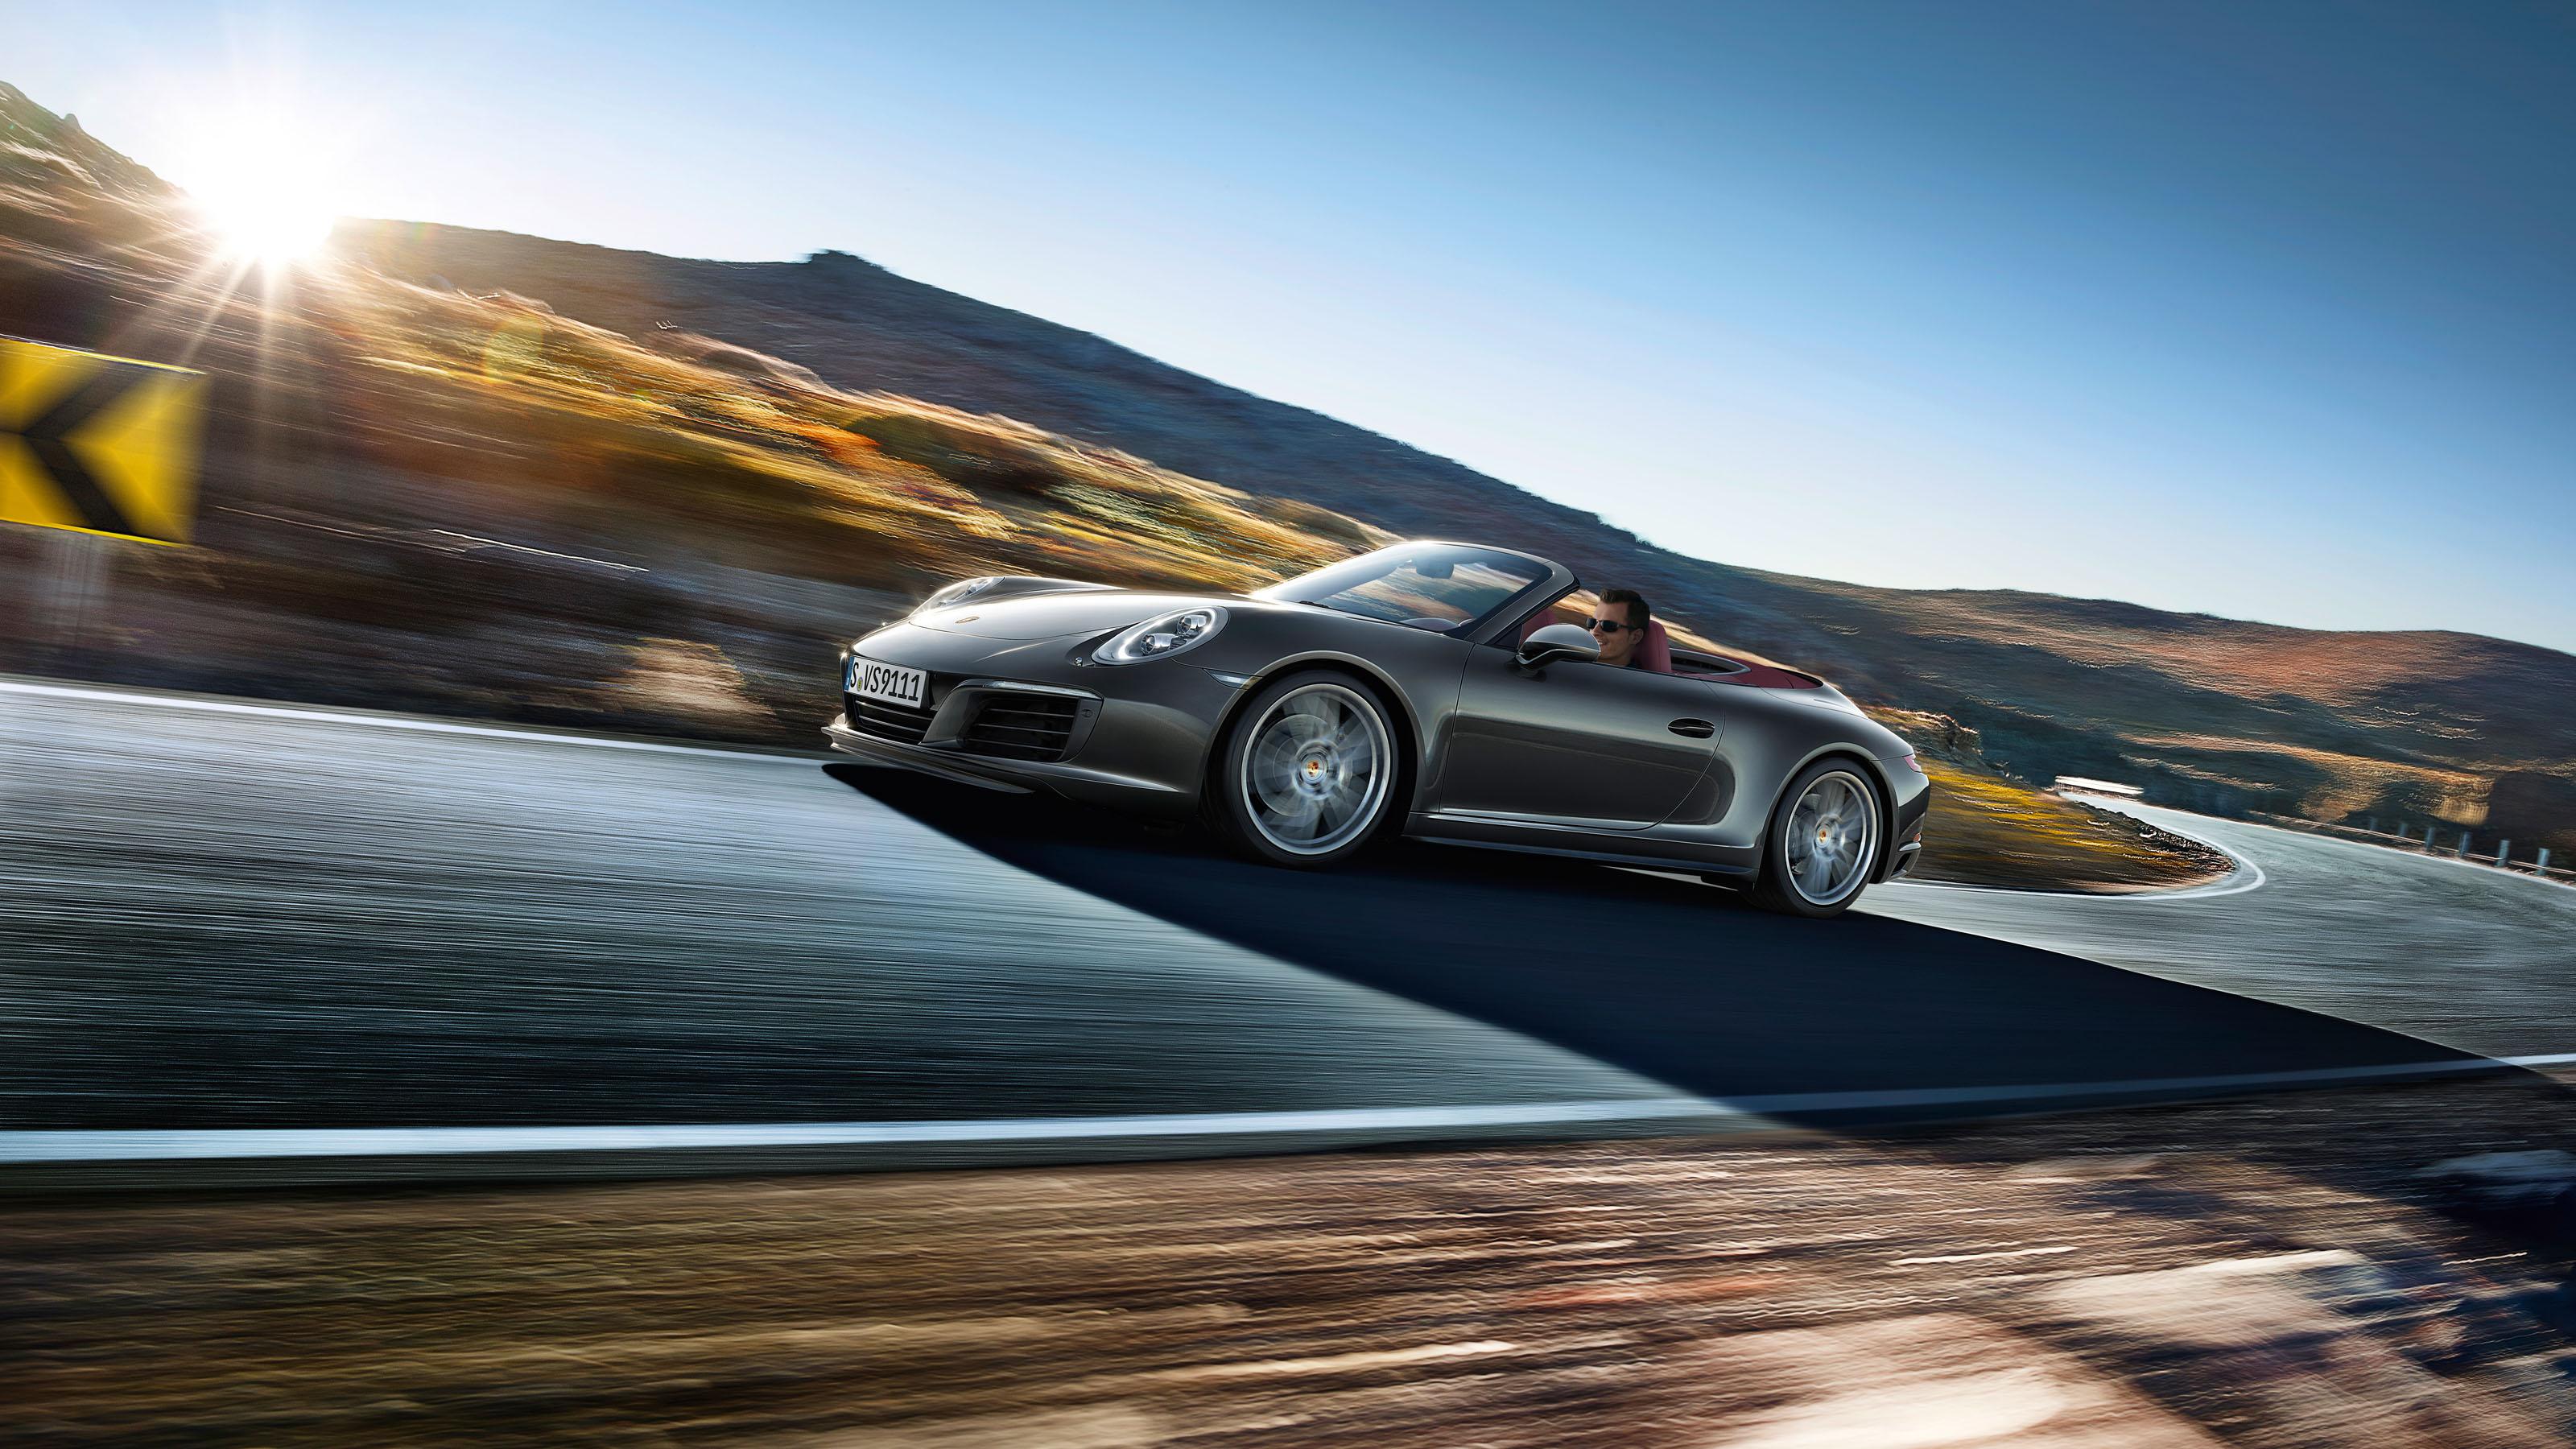 911 Carrera S Cabriolet 911 Modellen Porsche Centrum